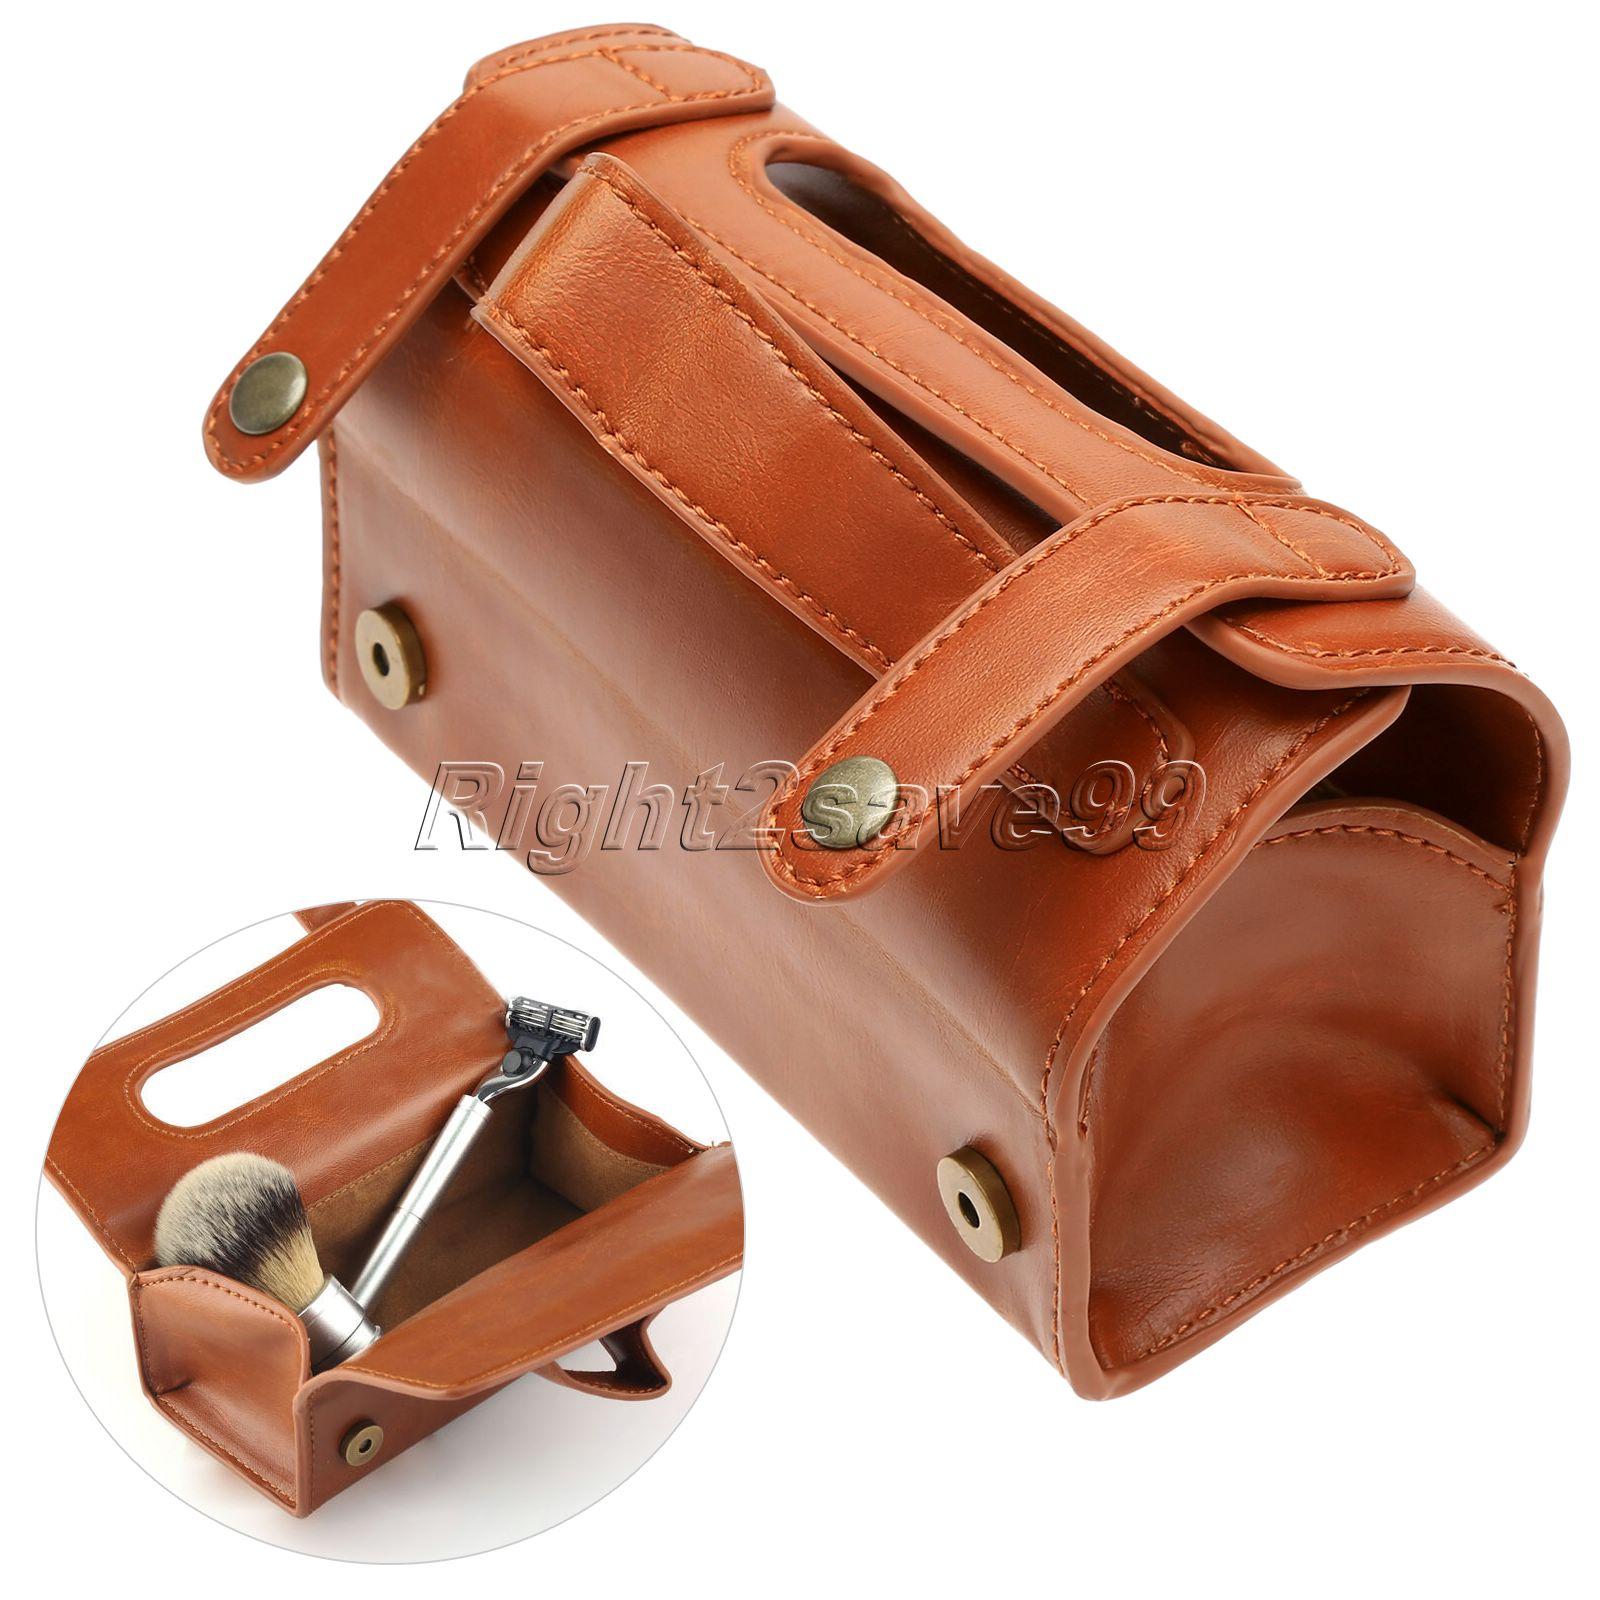 Męskie PU Leather Travel Kosmetyczka Golenie Wash Case Torba organizator Dark Brown Dla golarki Golenie Shaving Gift Container